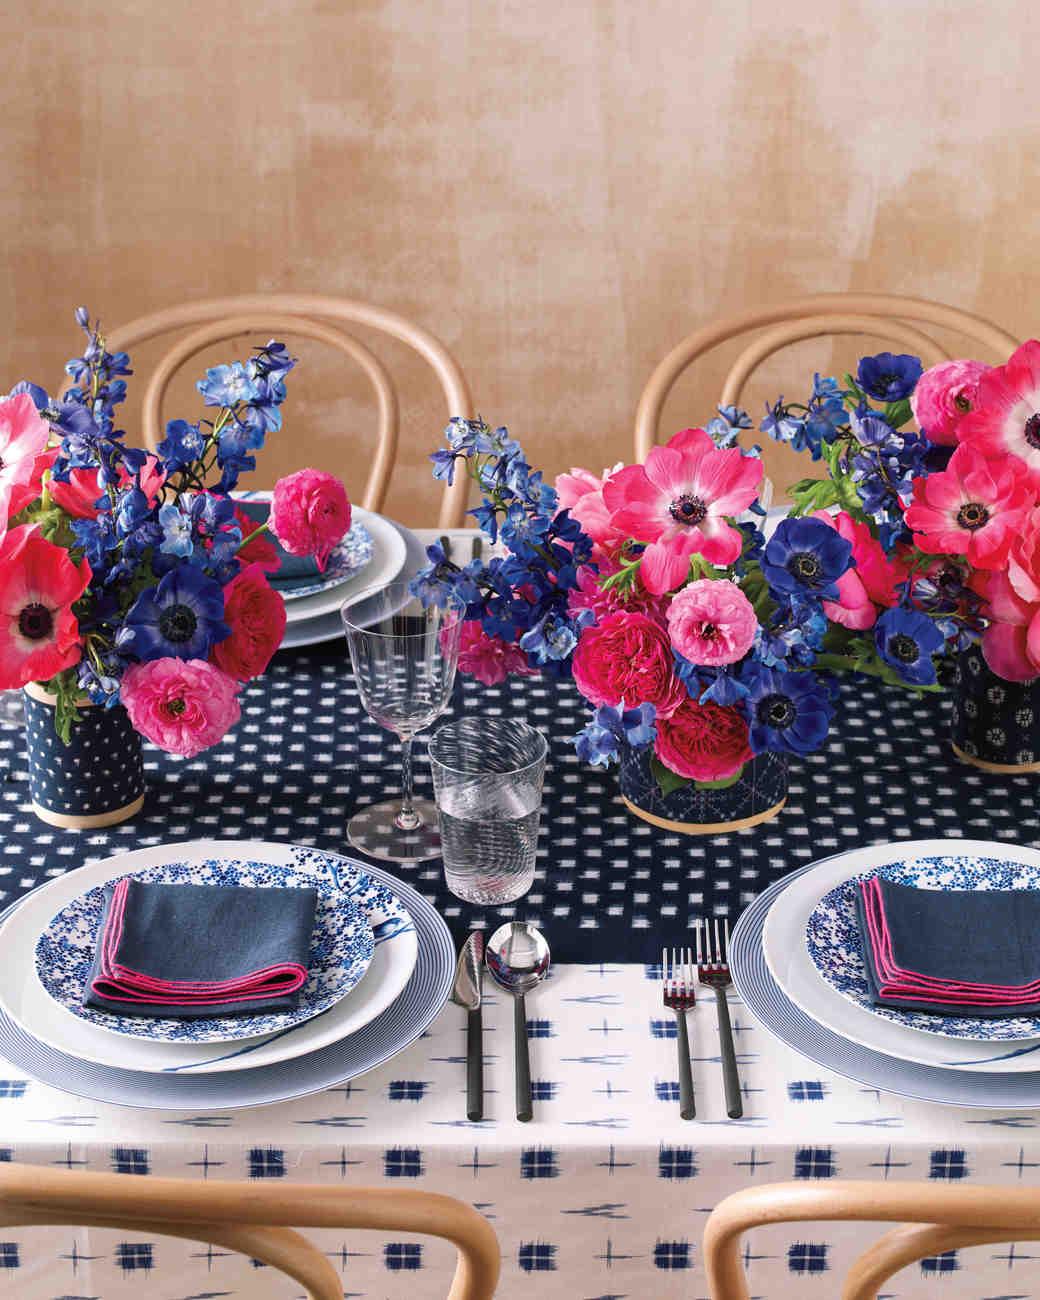 table-setting791-mwd110739.jpg